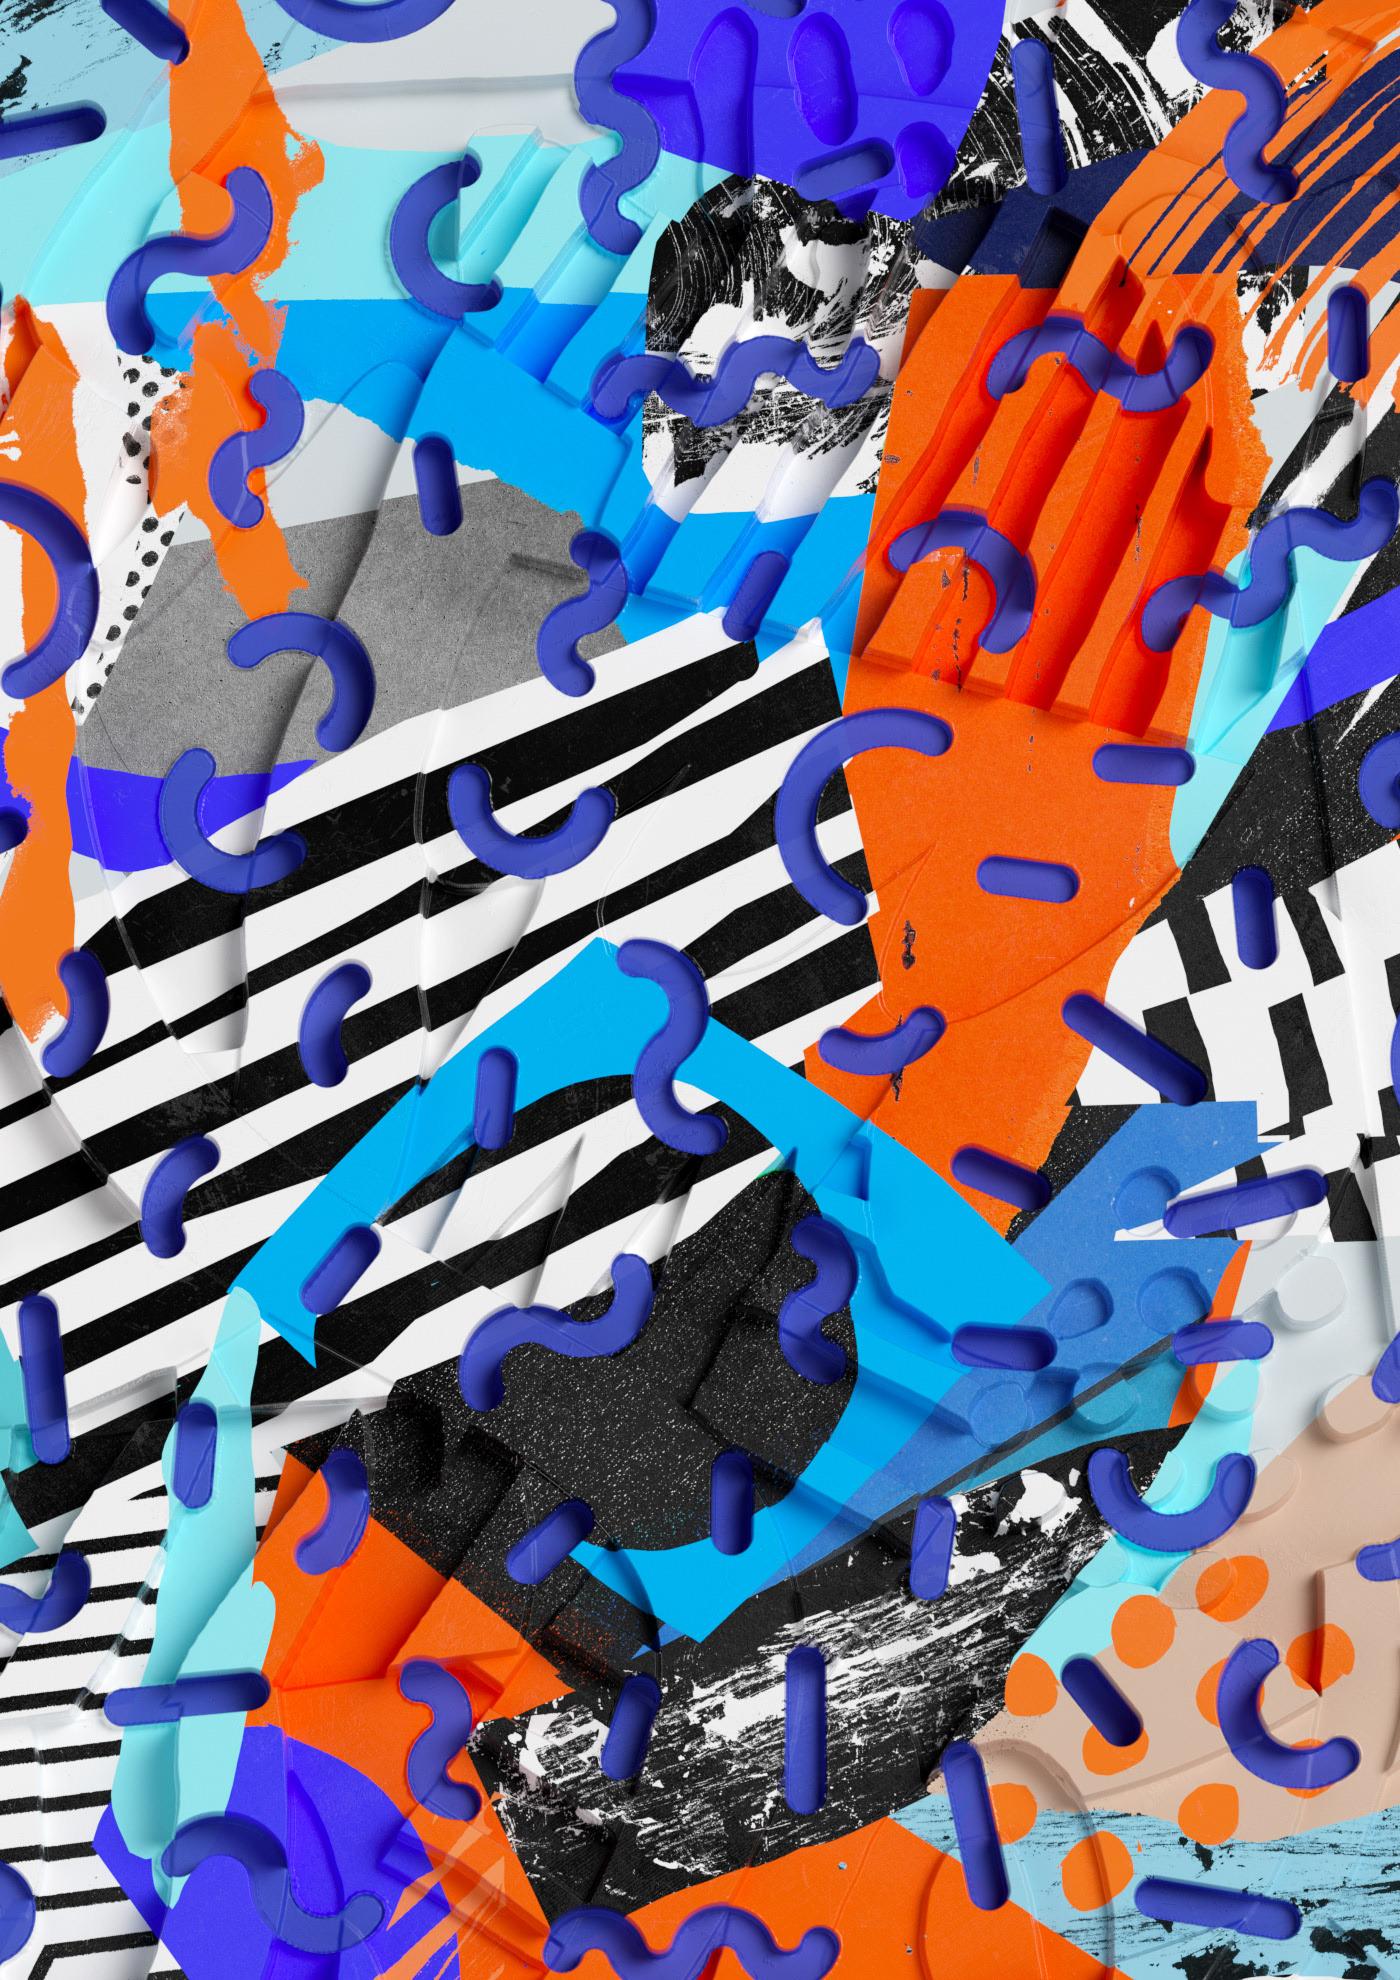 Traversing Patterns & Textures with Danny Ivan - Digital Art